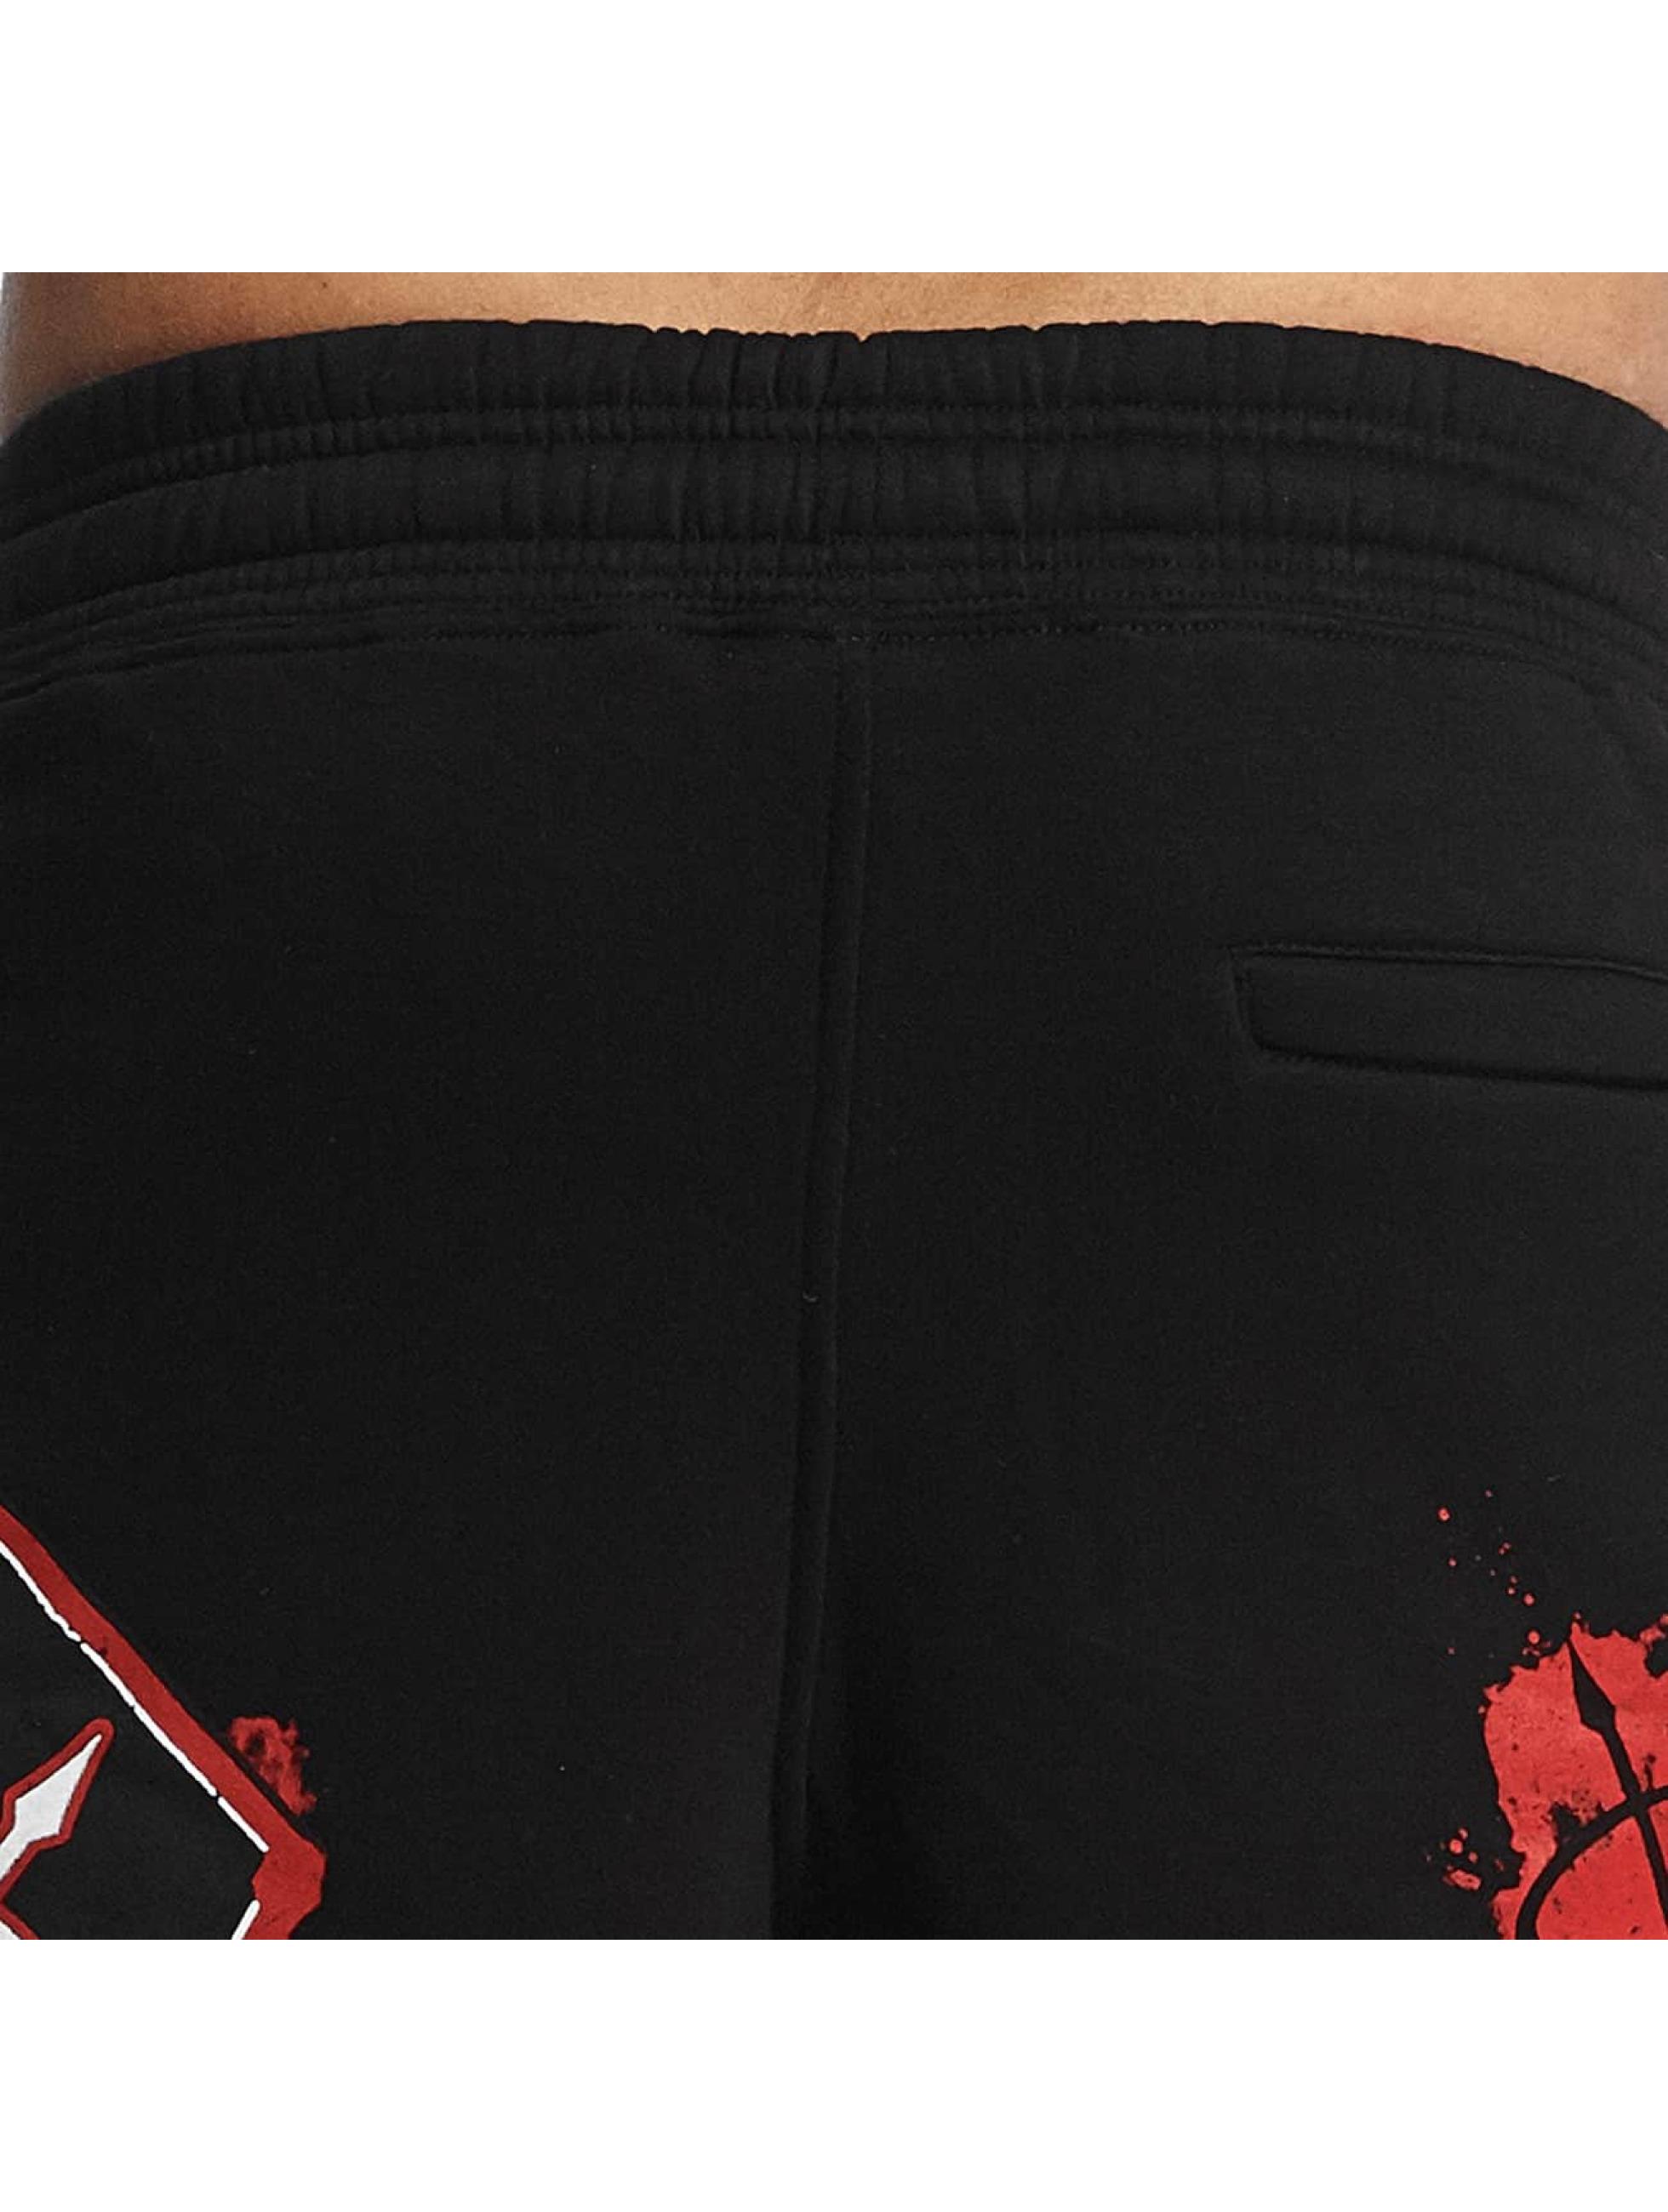 Pro Violence Streetwear Pantalón cortos Bloodsport negro